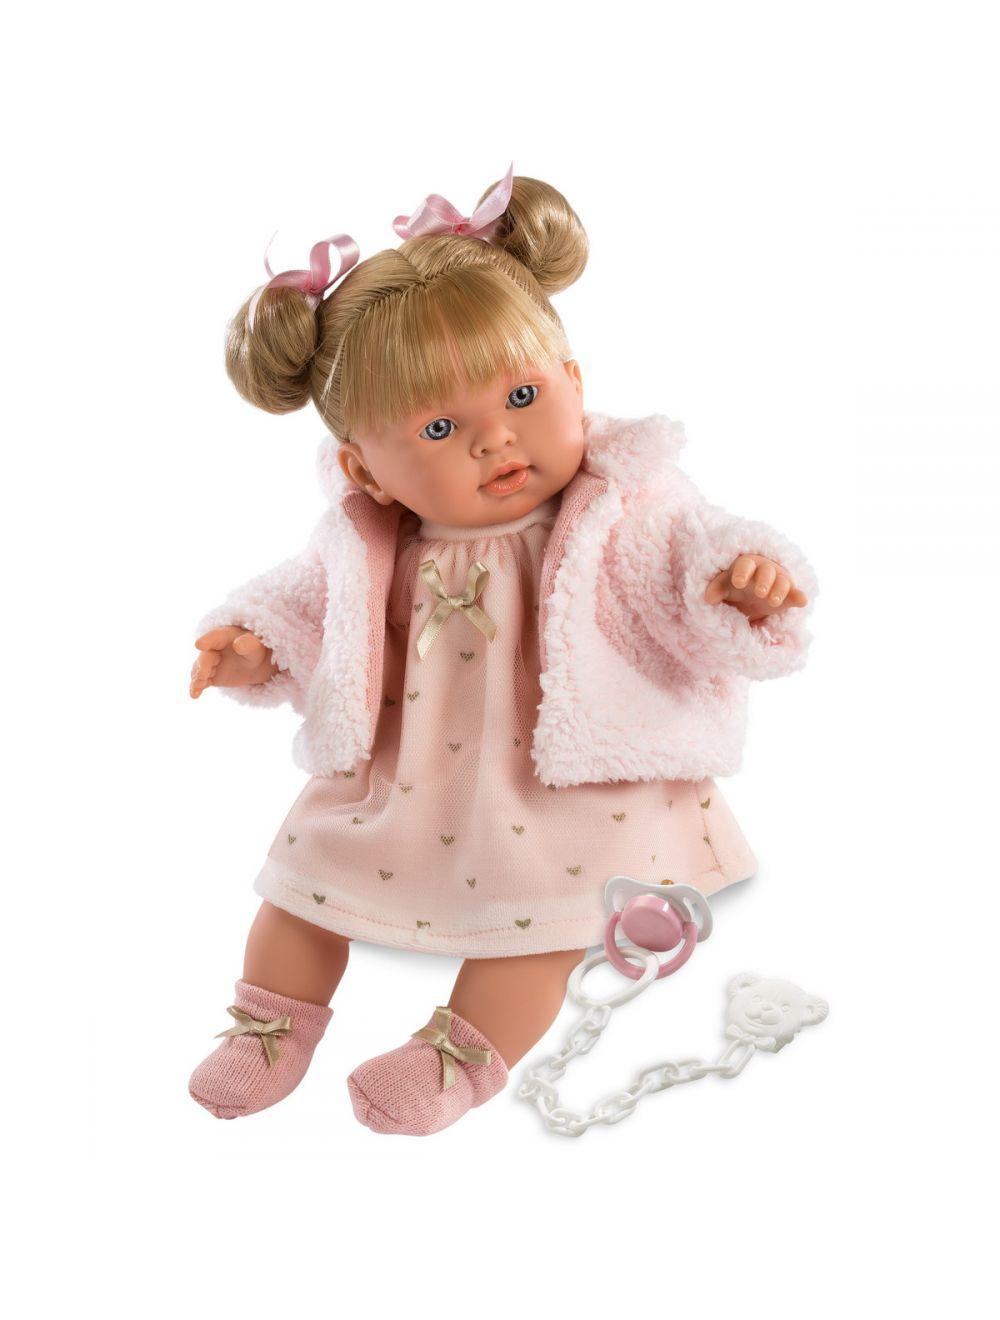 Llorens 42258 Lalka płacząca Alexandra 42 cm blondynka różowa sukienka